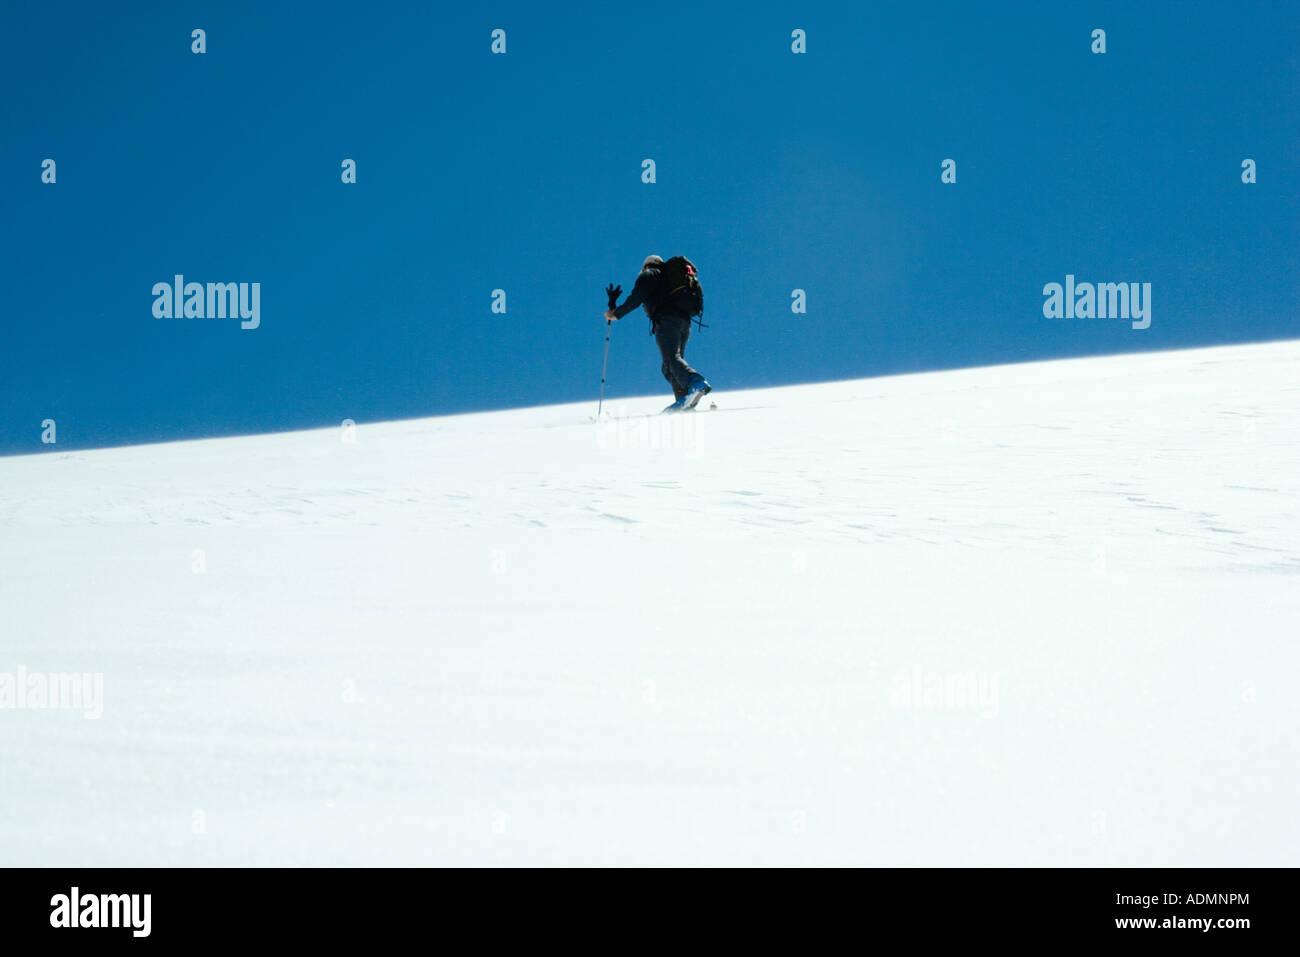 Skier - Stock Image